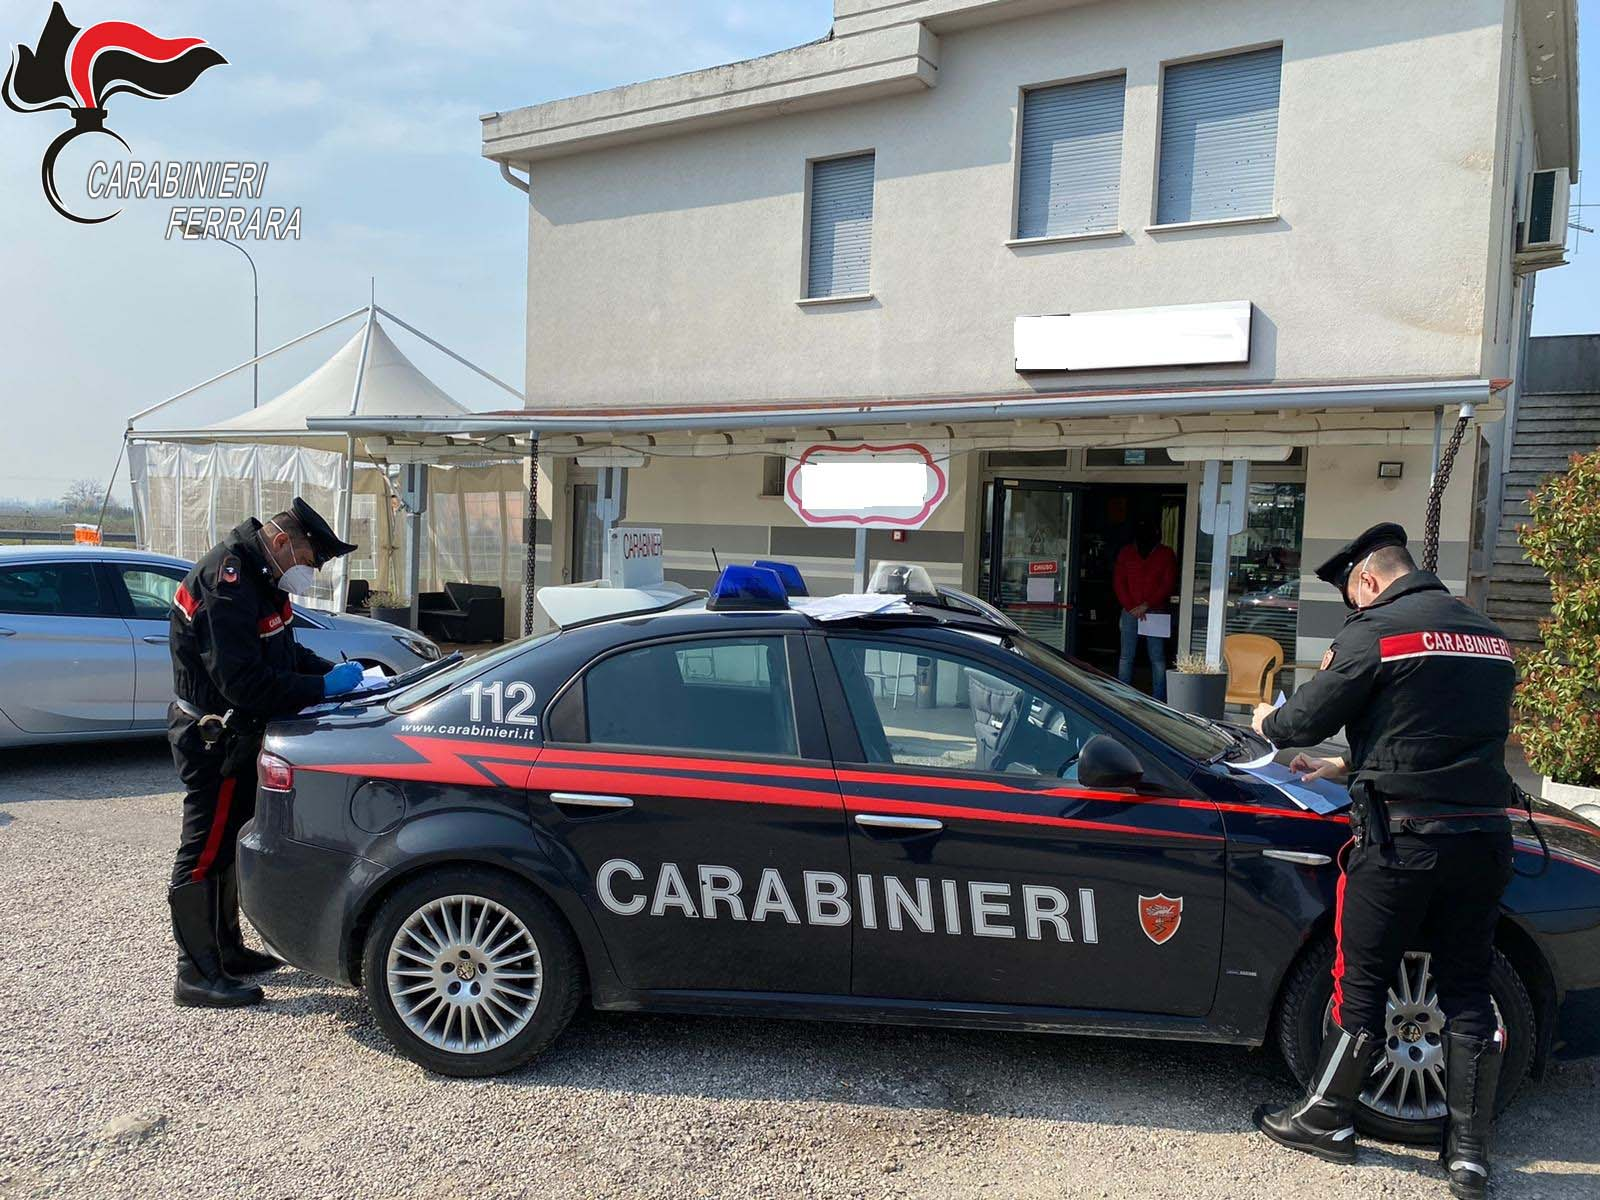 cc carabinieri